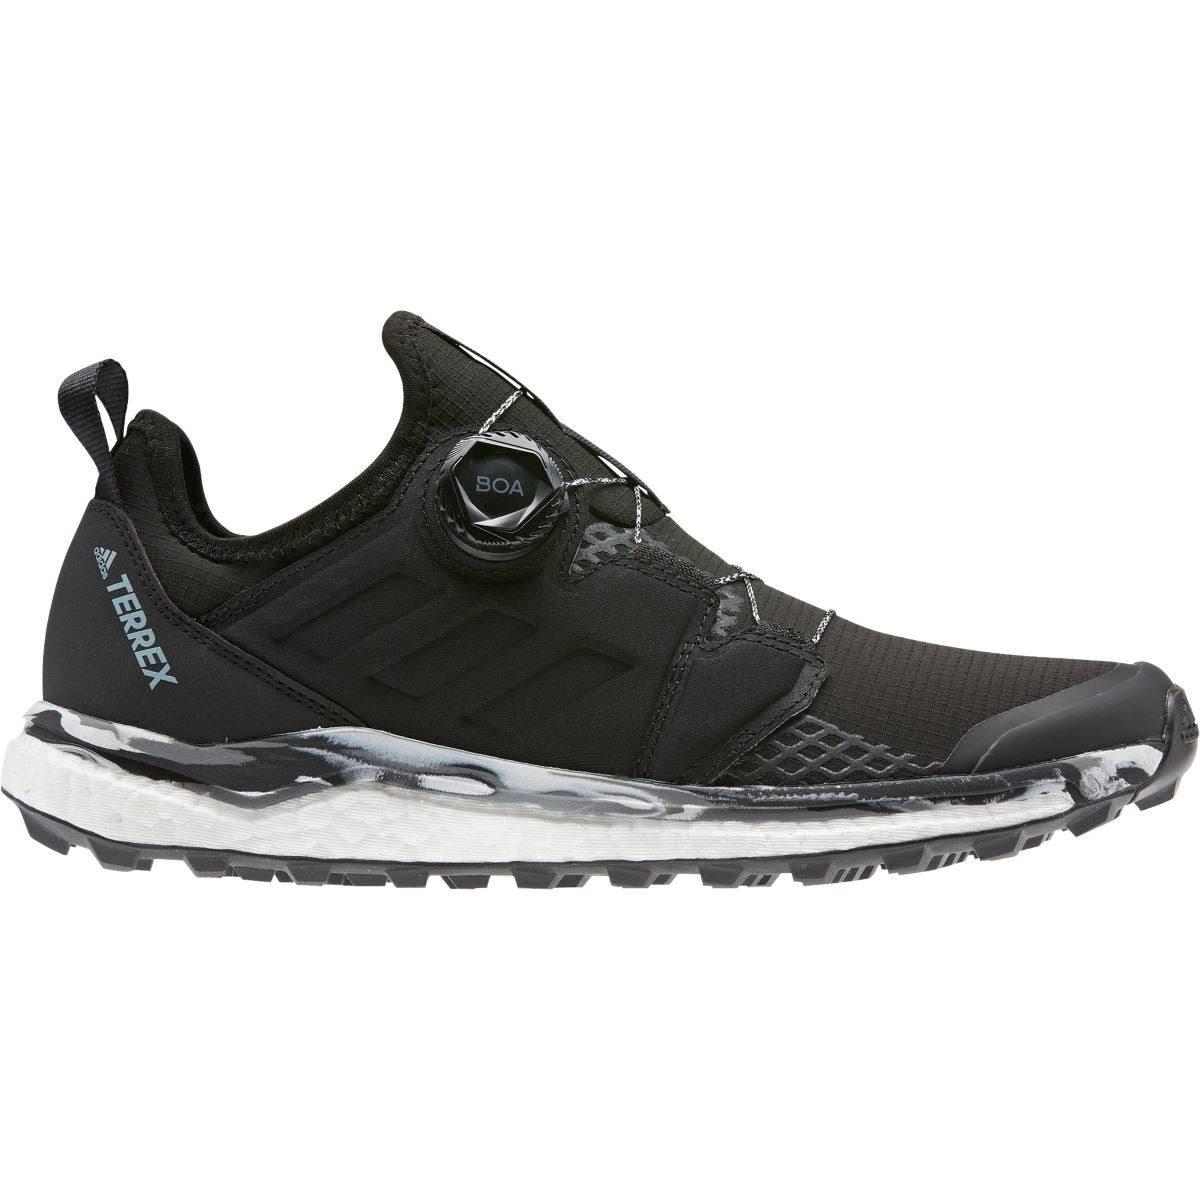 Adidas Women's Terrex Agravic Boa Shoes - UK 6 Core Black